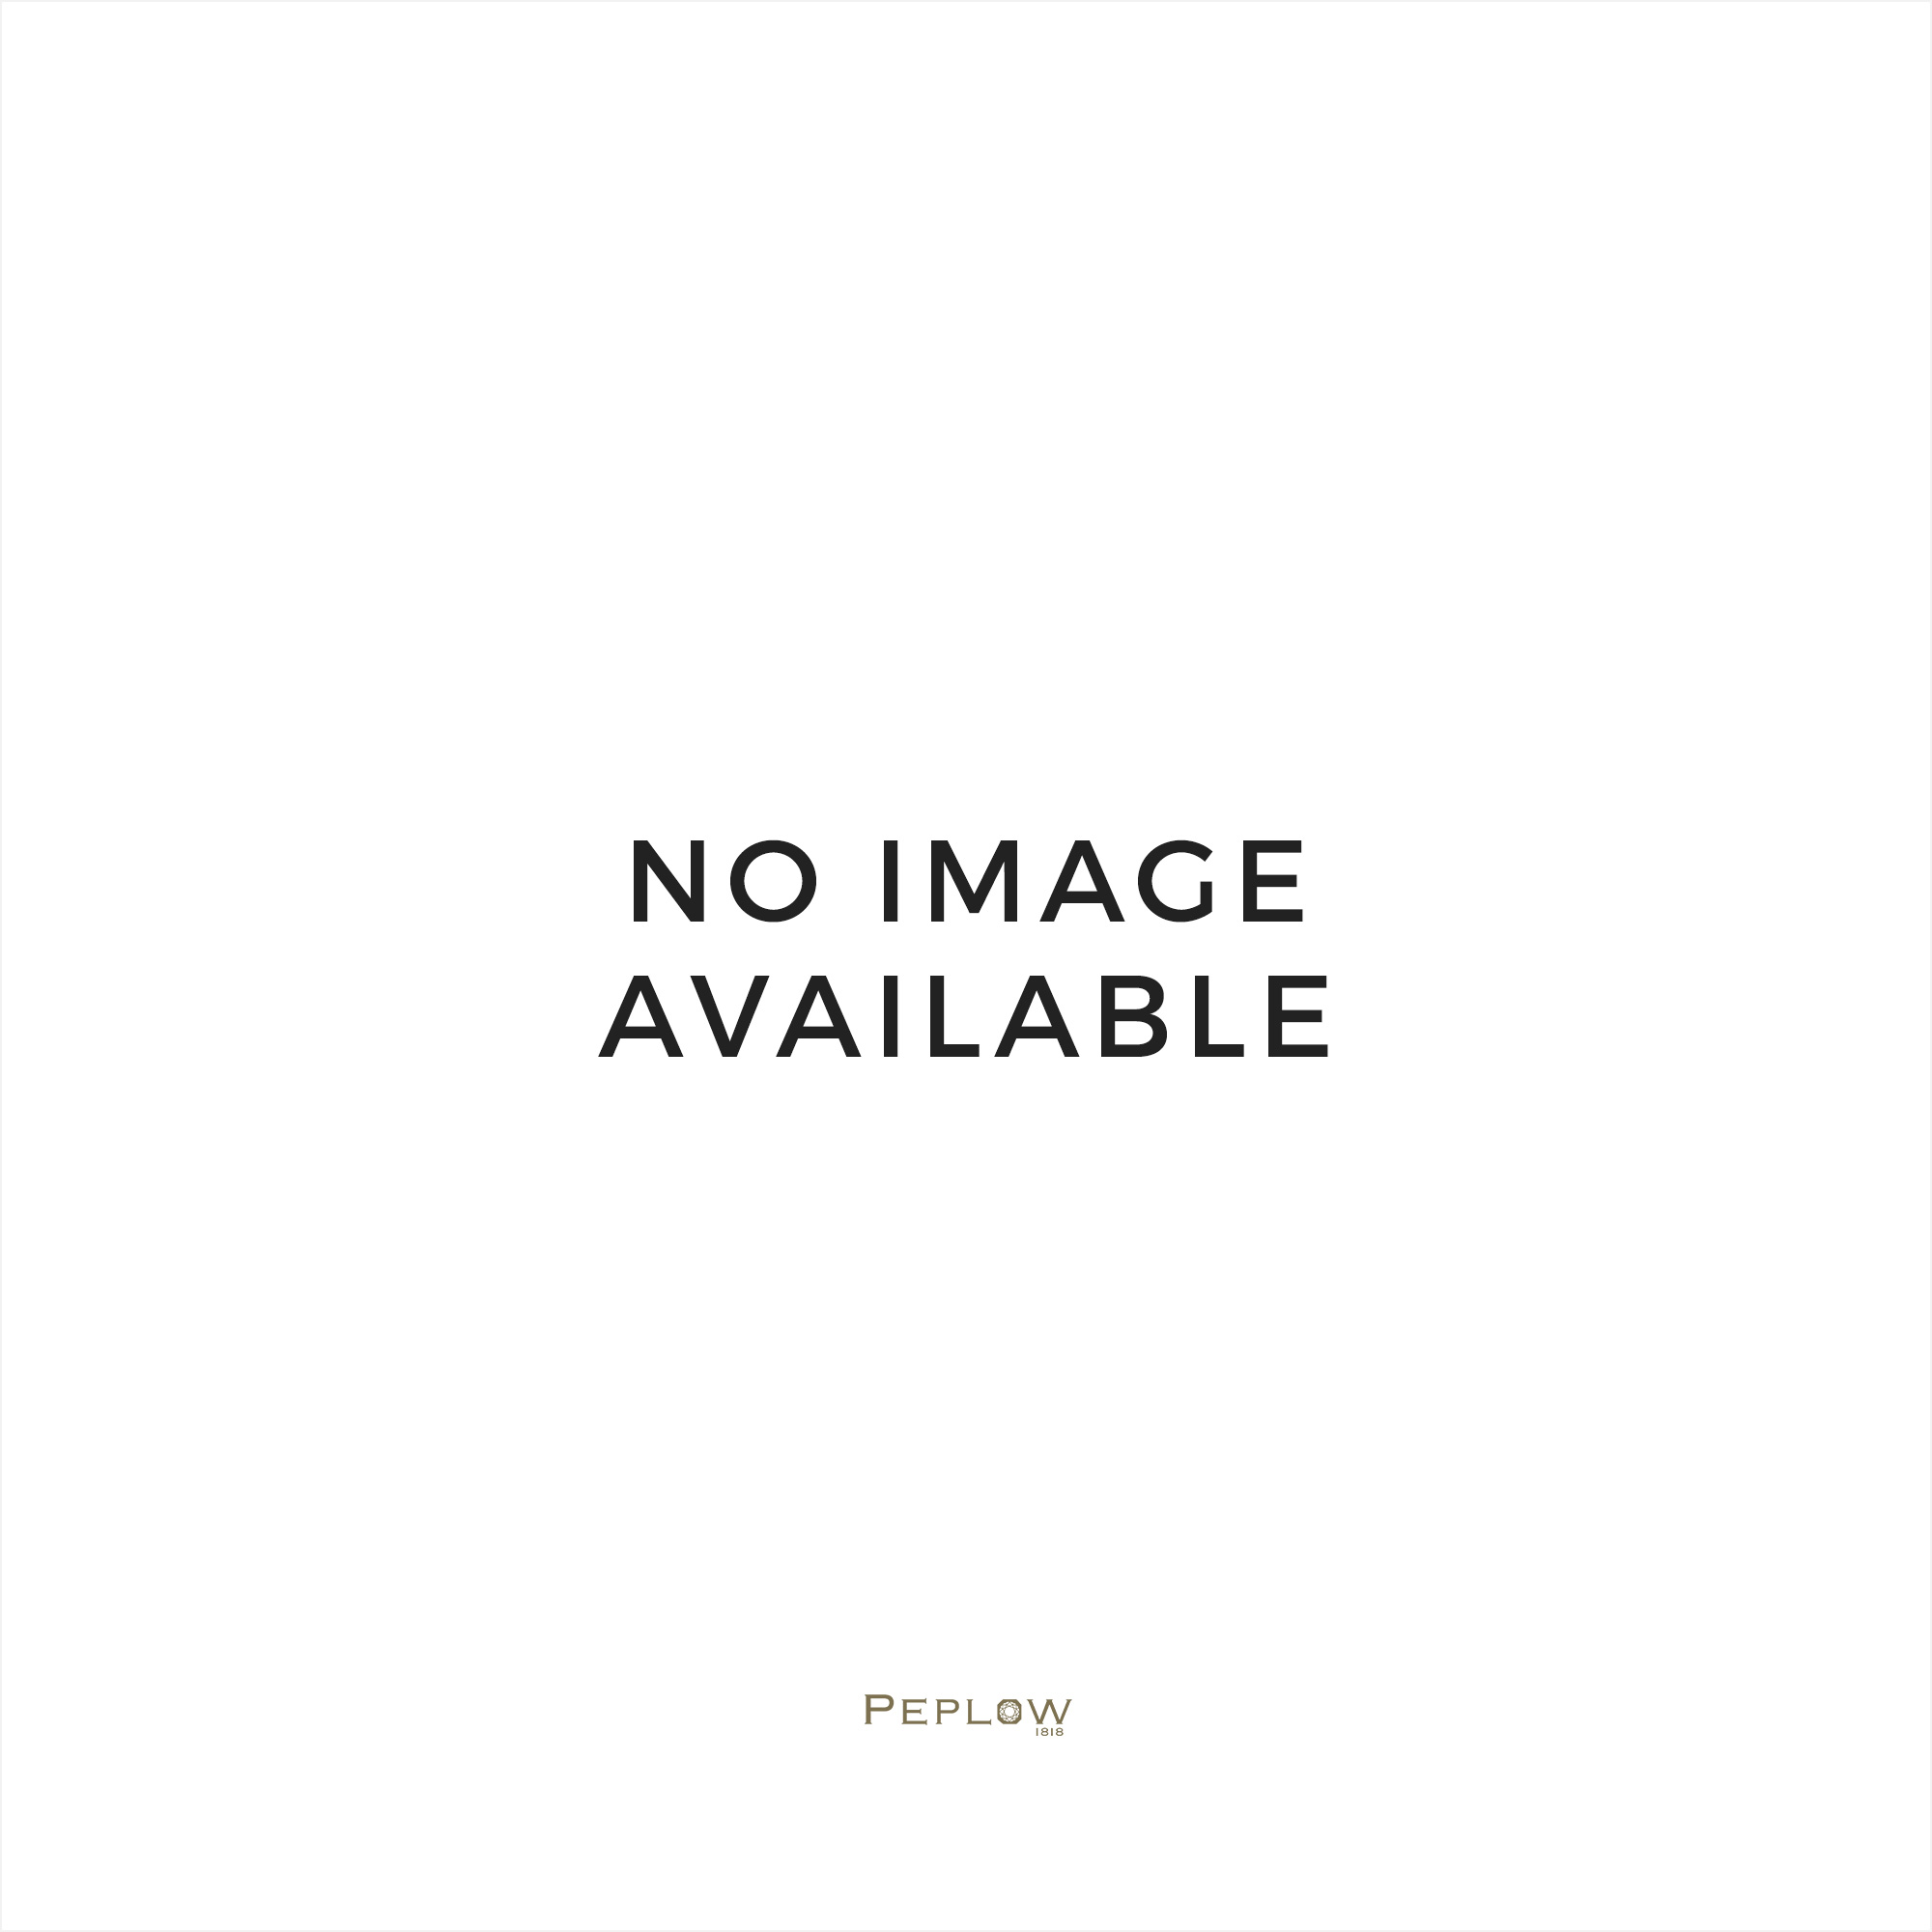 Rolex Watches Ladies 18 carat gold Rolex Datejust with diamond set bezel.